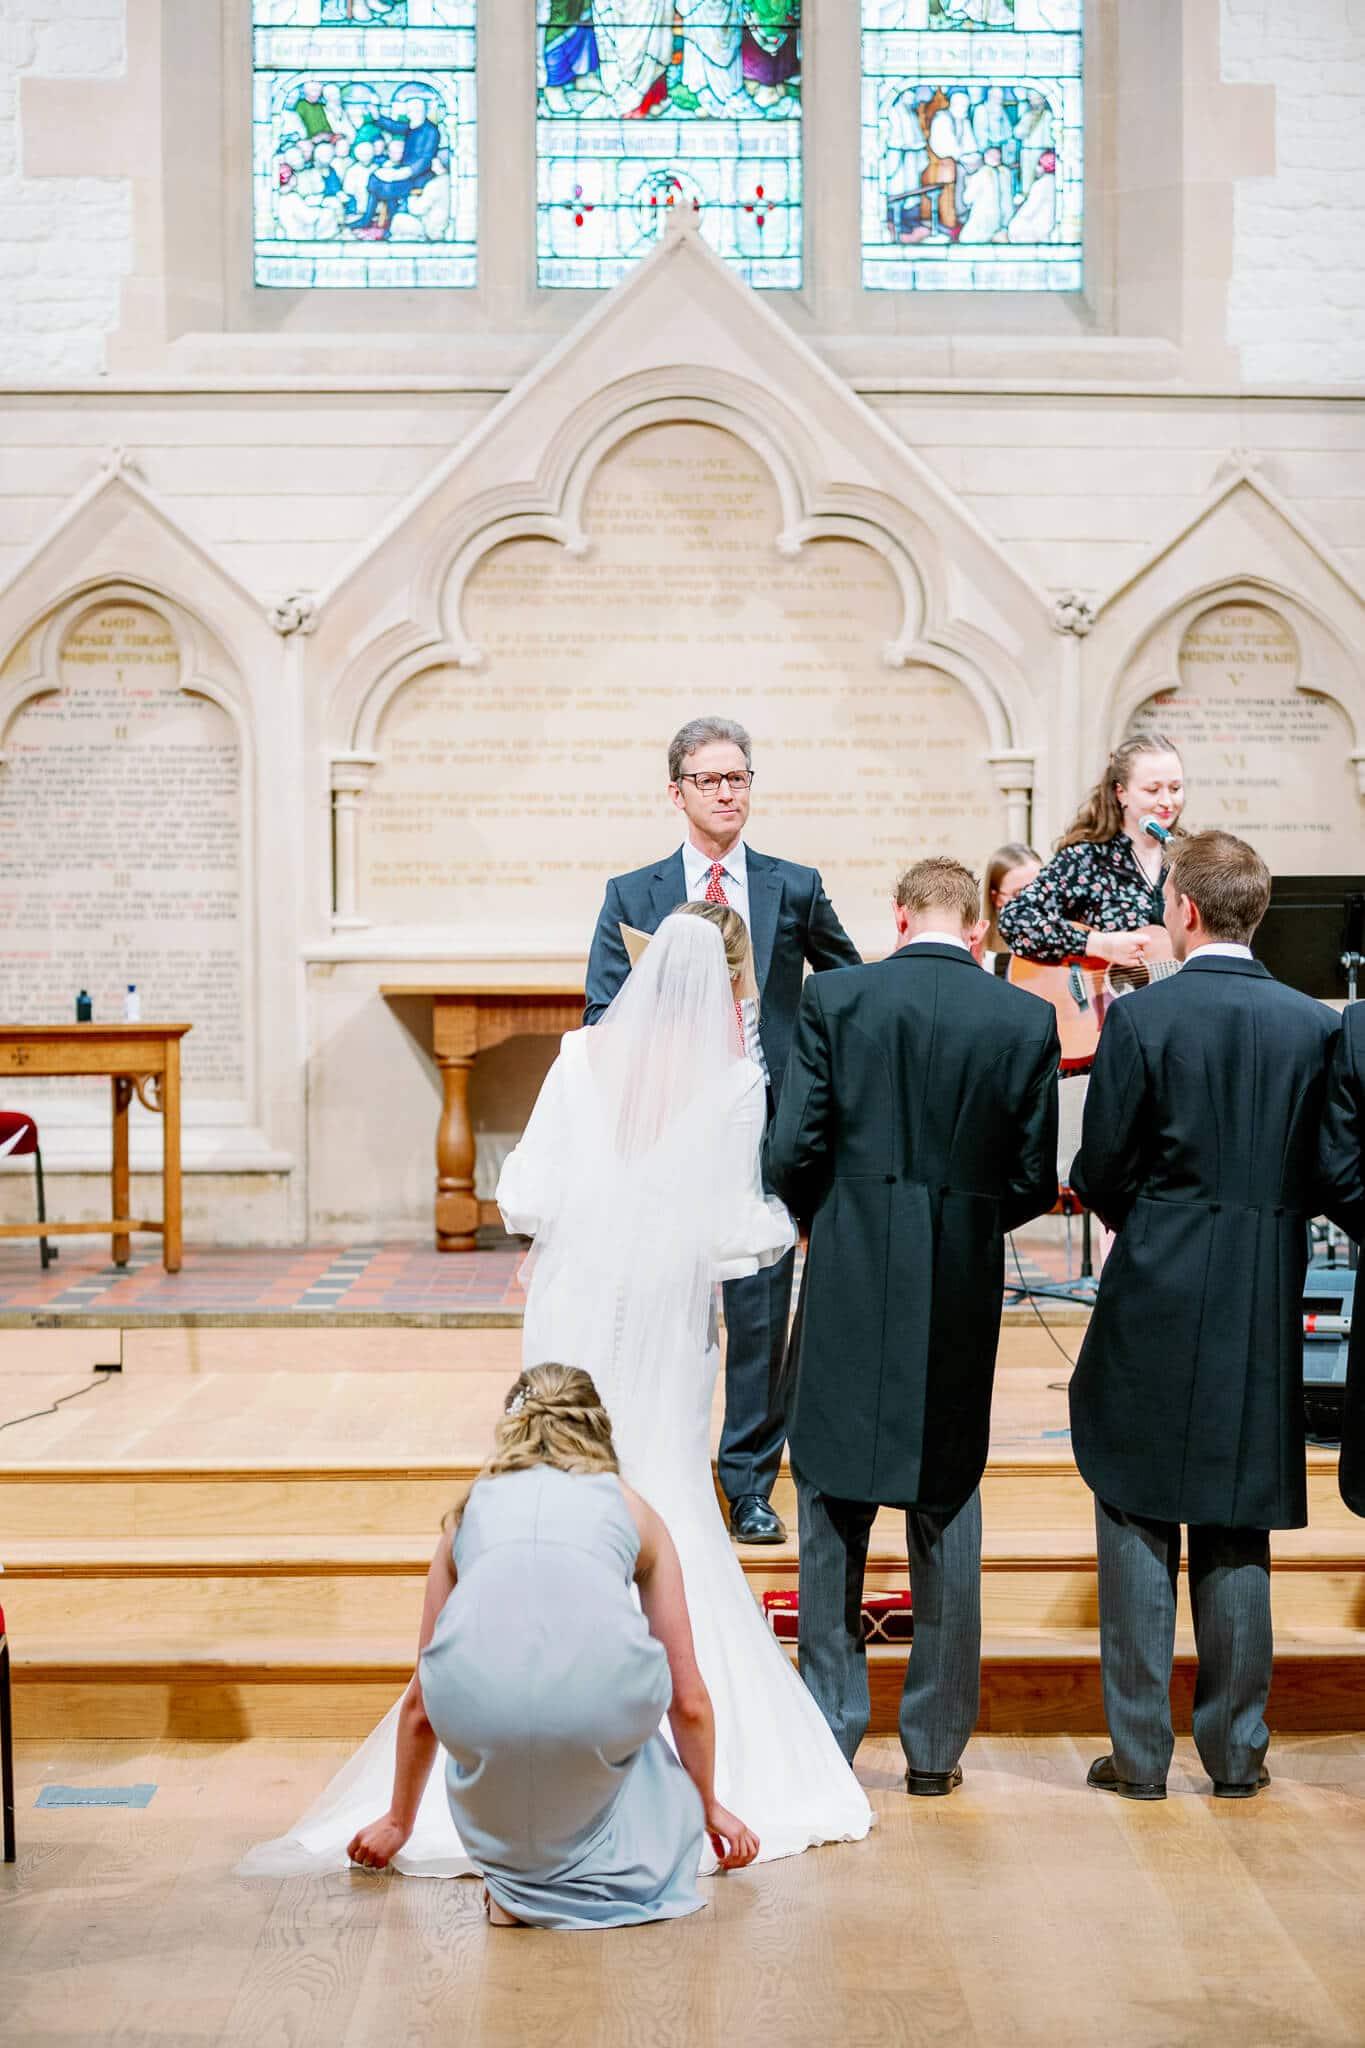 Brid and Groom St Ebbs church wedding ceremony in Oxford